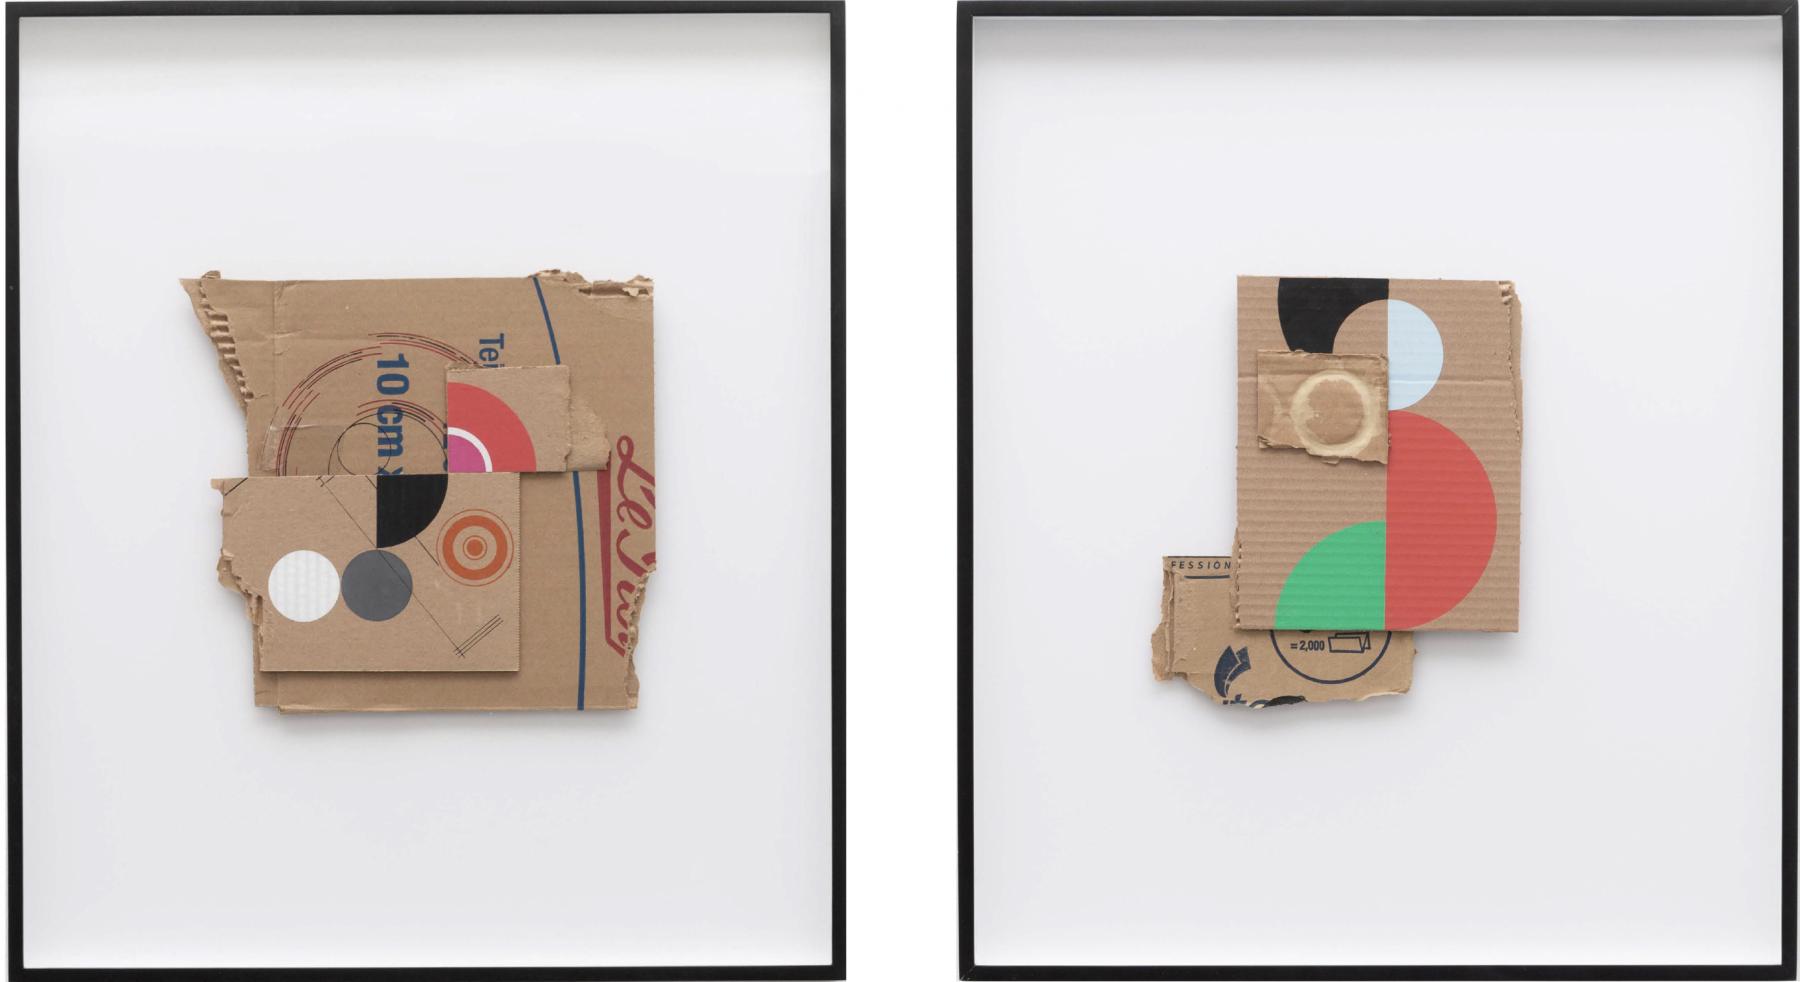 cardboard due 1